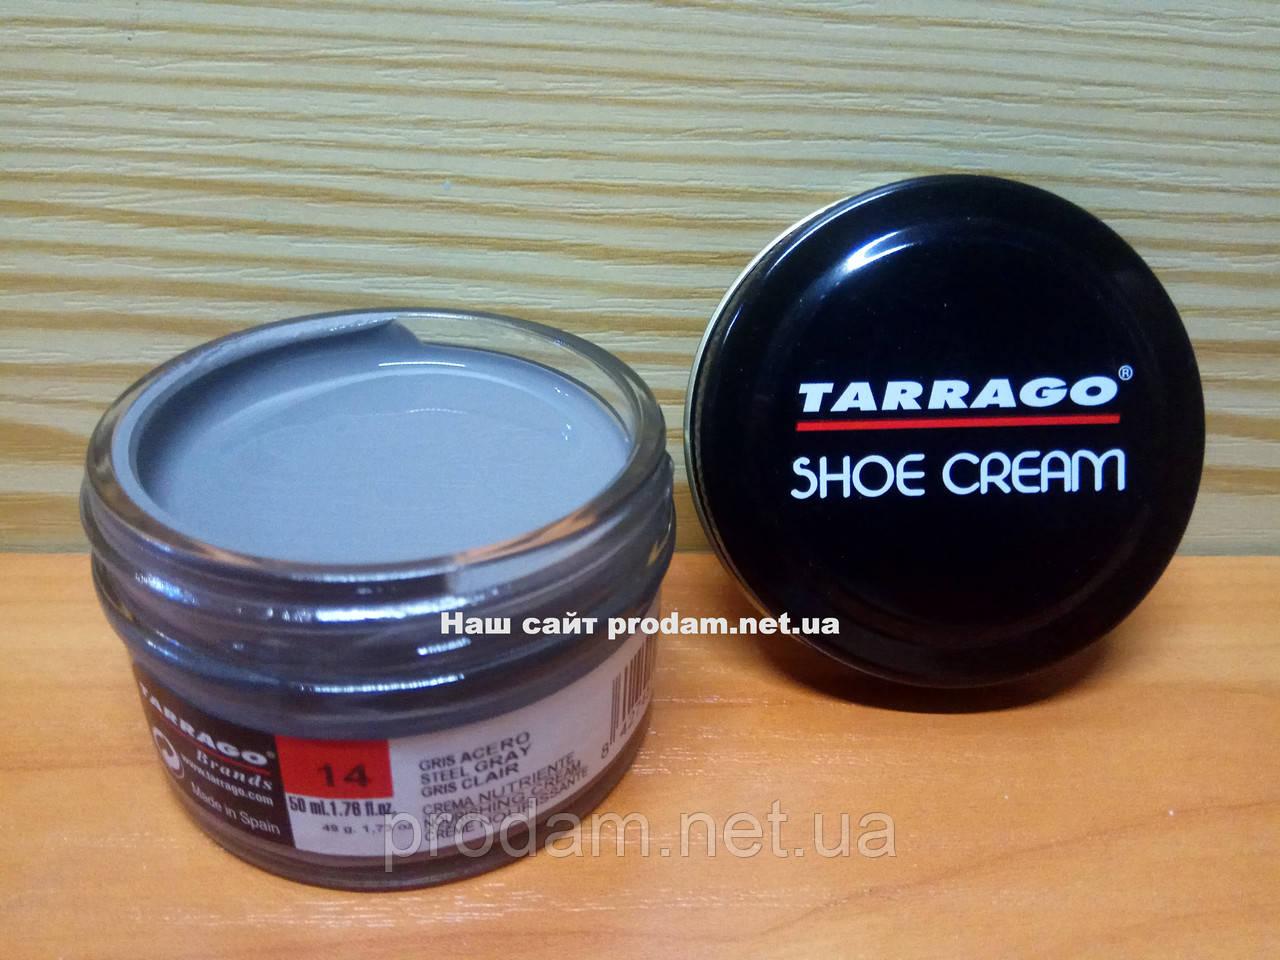 Крем для обуви Tarrago 014 steel gray